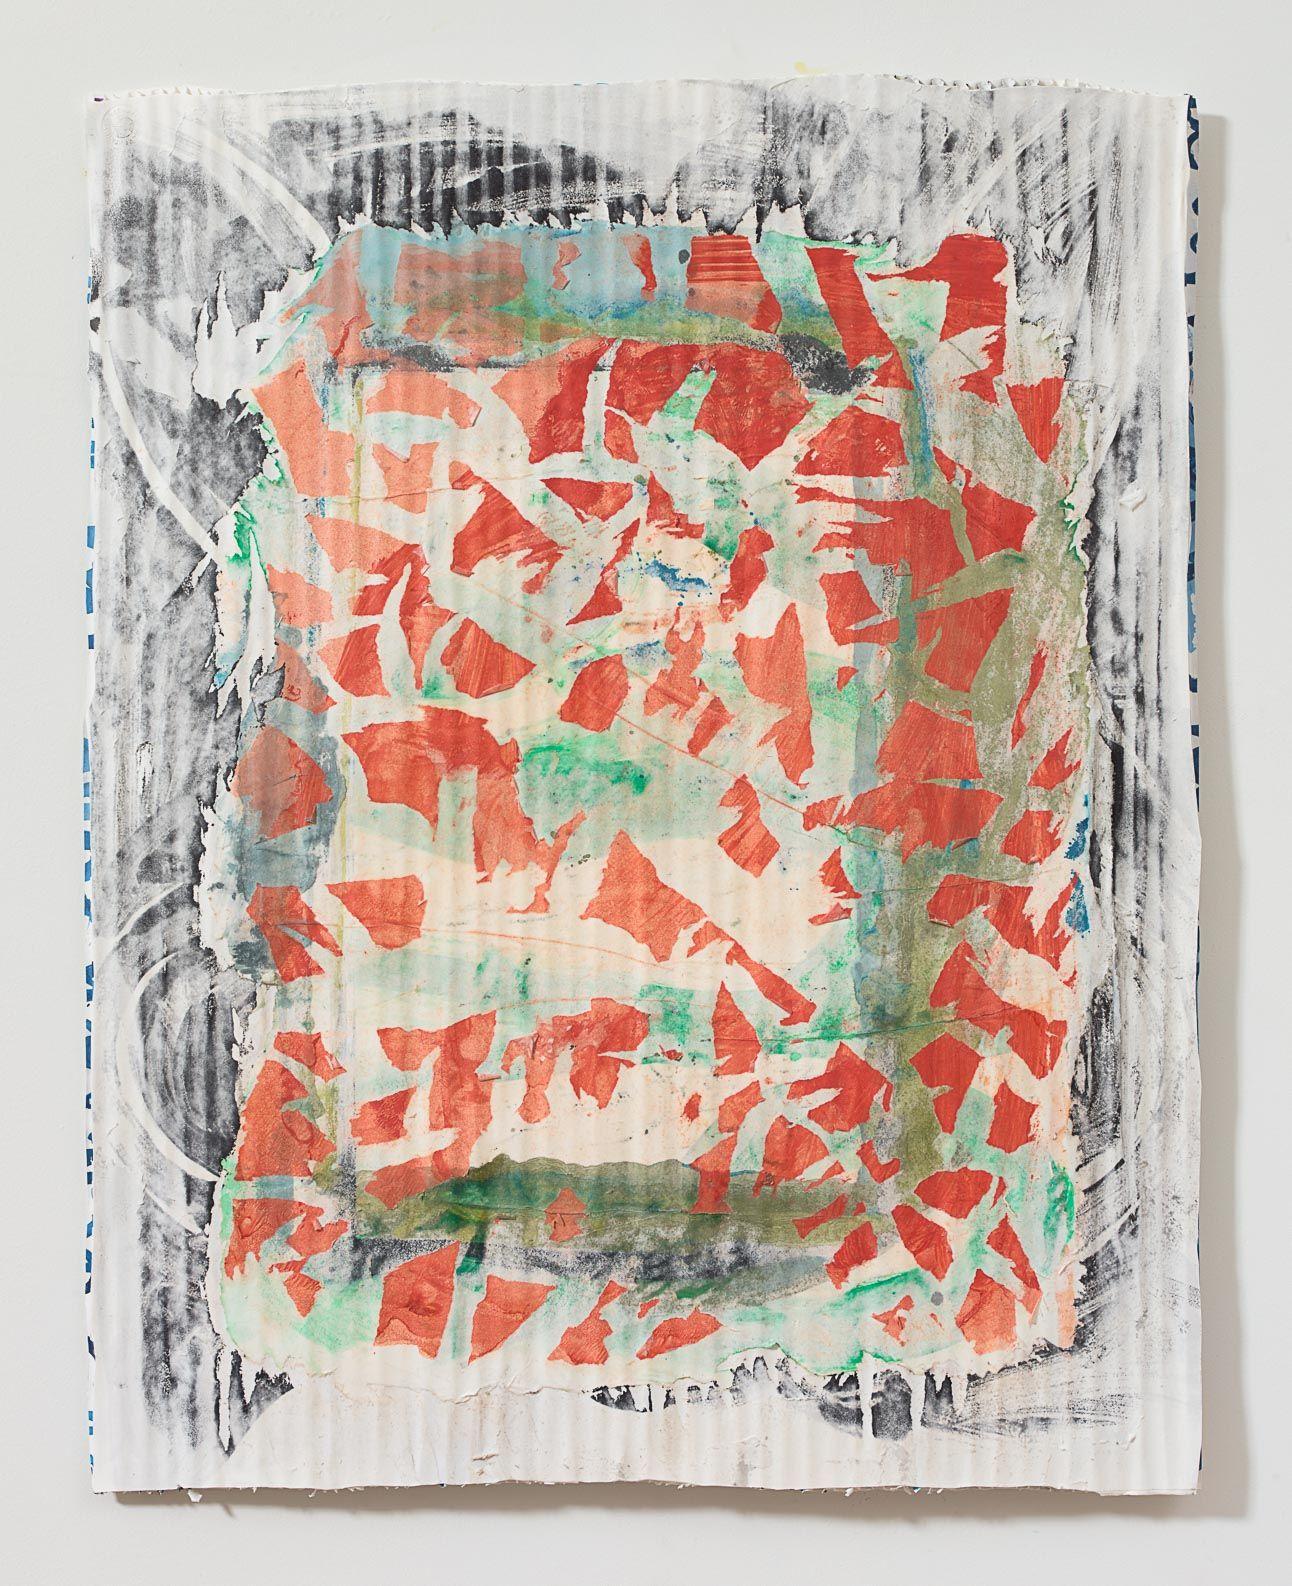 Mark Fox Untitled, 2017